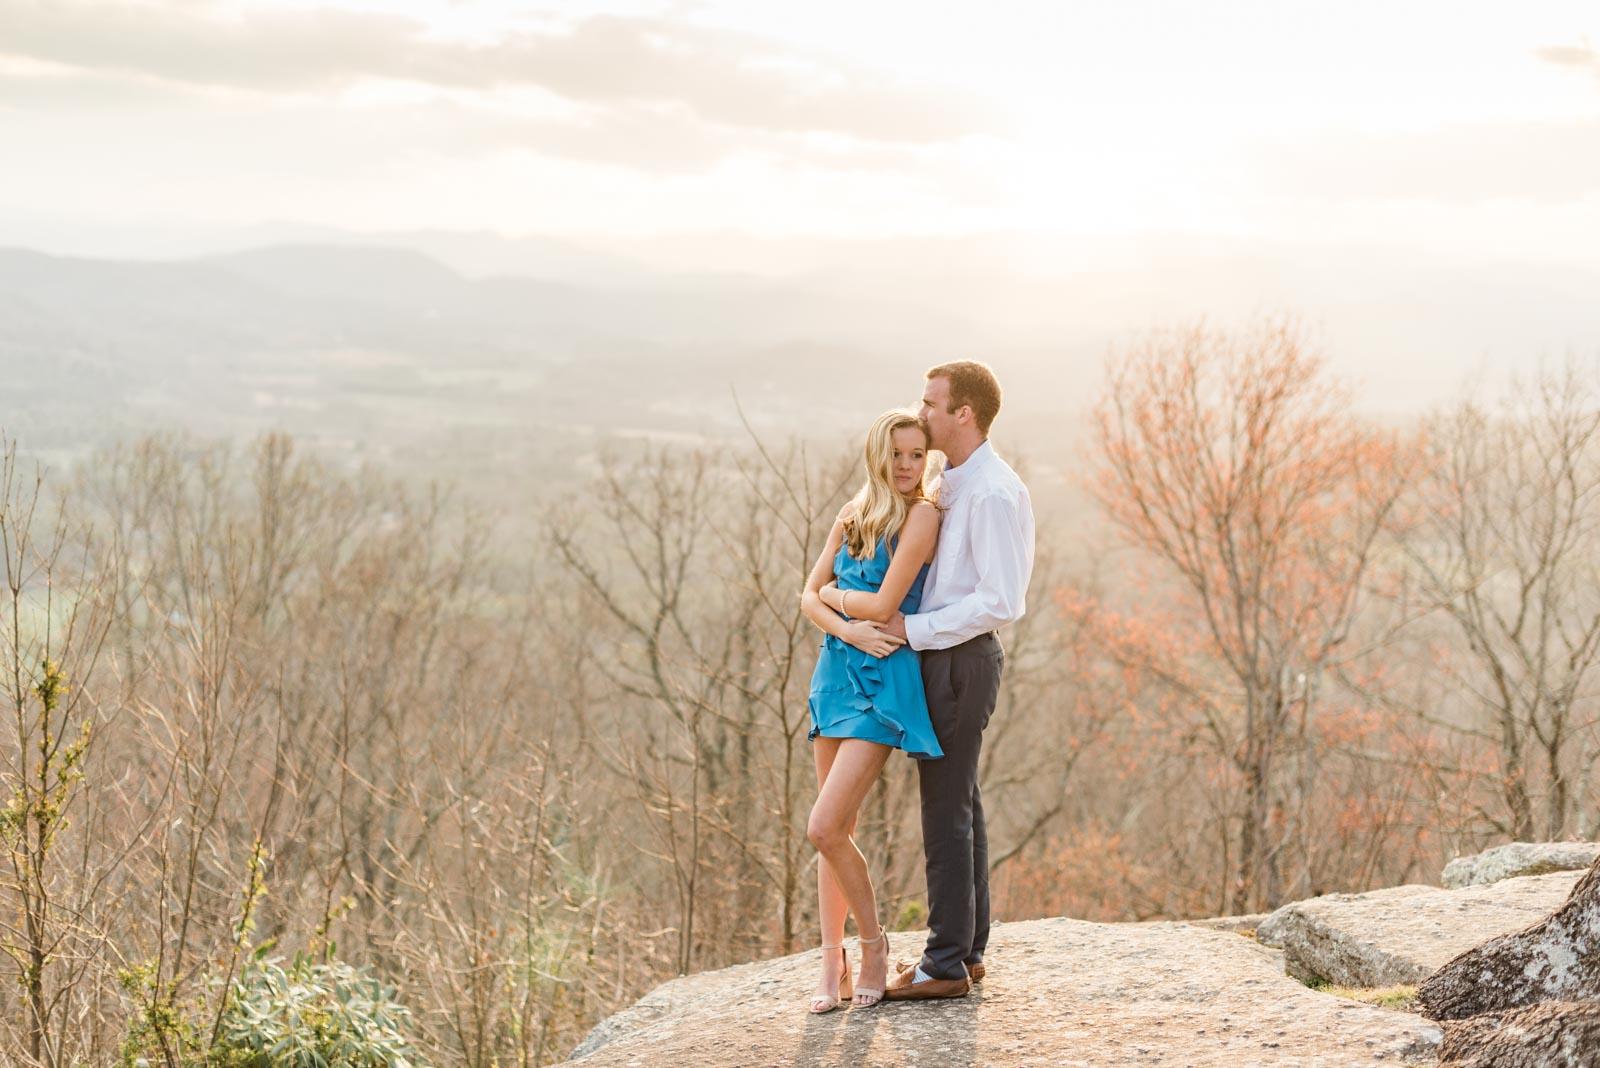 Sunset Mountain Engagement in North Carolina Morgan & Nathan Markie Walden Photography-19.jpg